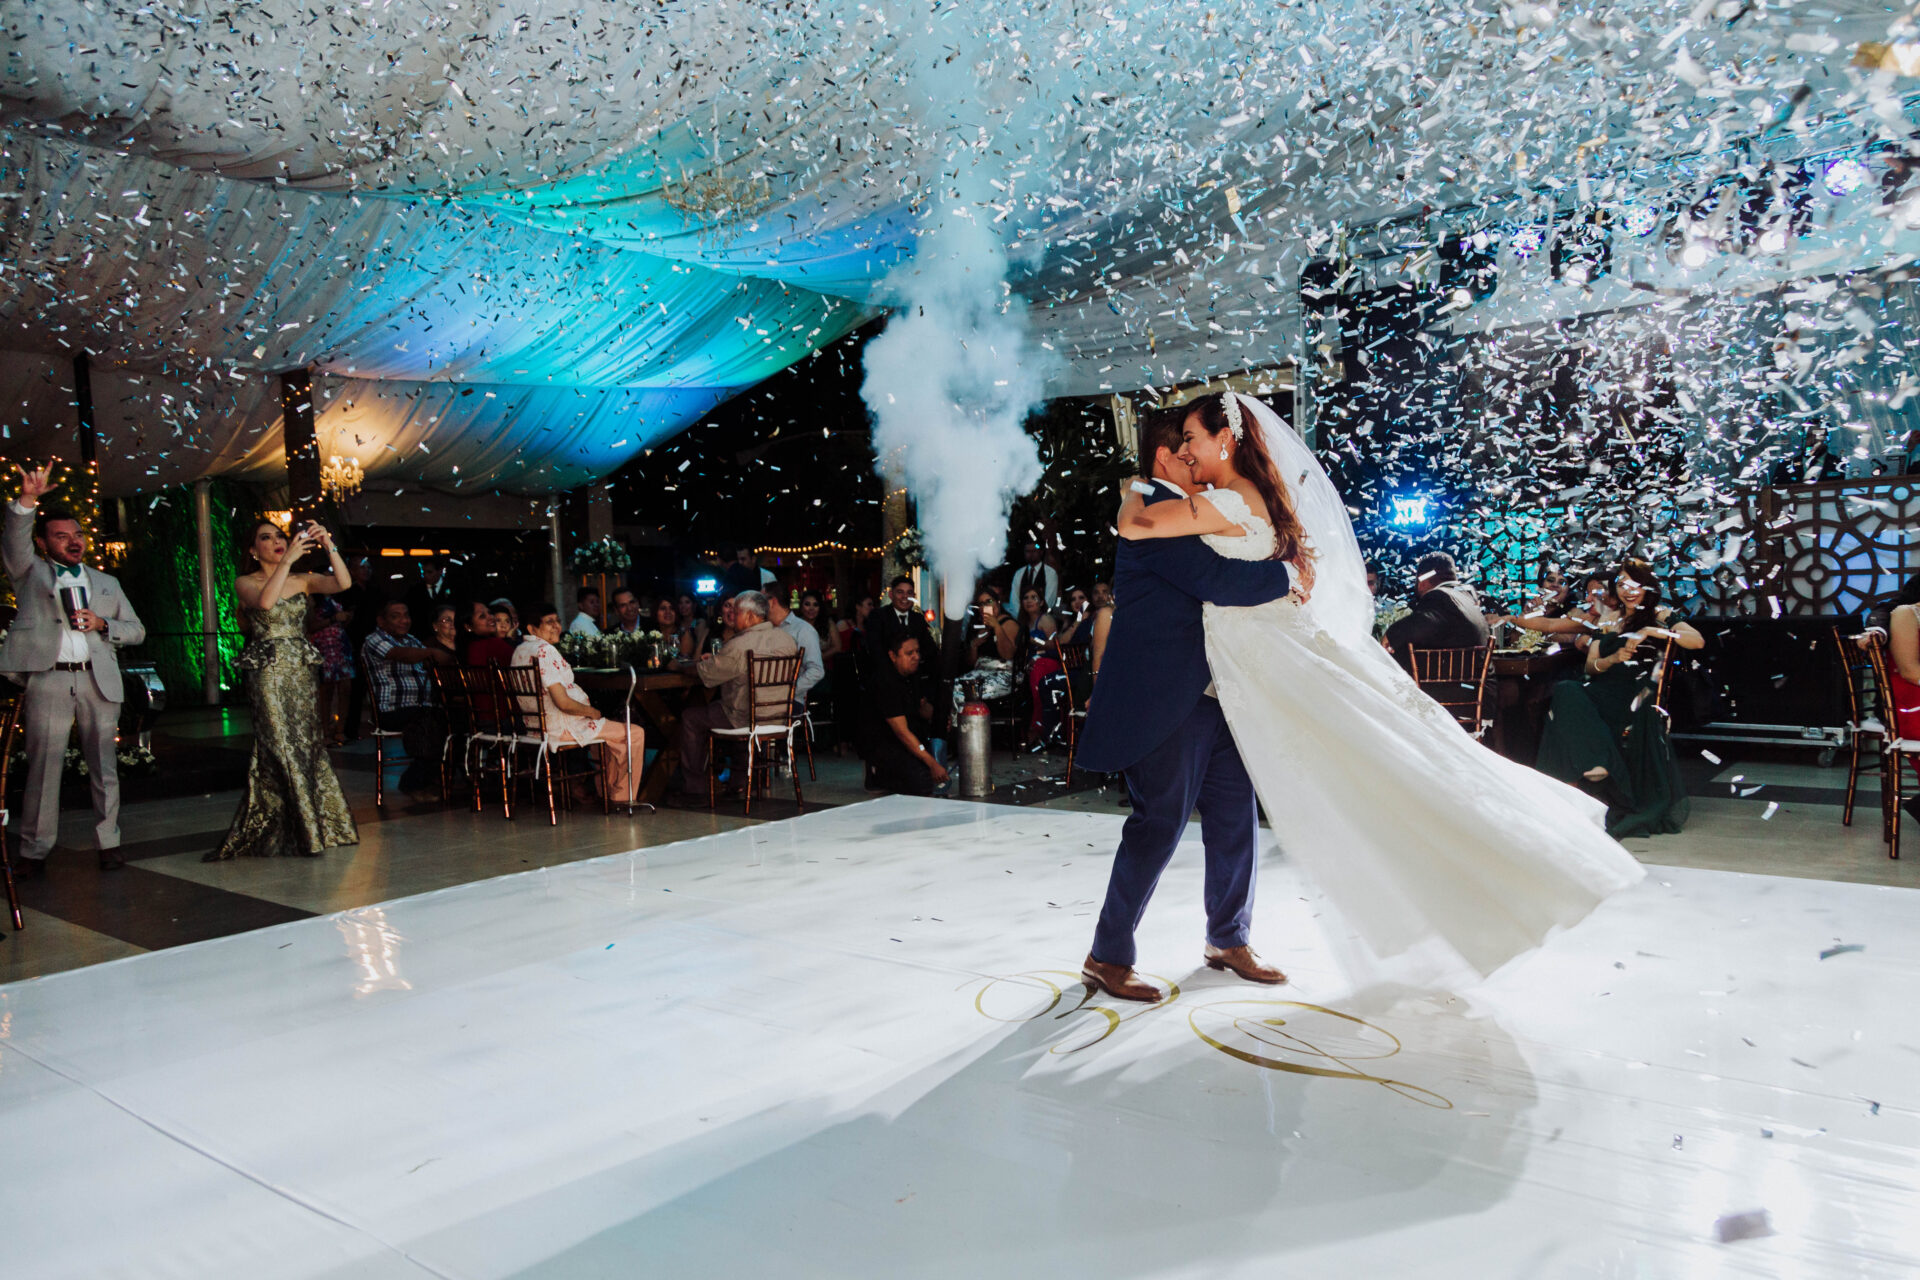 javier_noriega_fotografo_bodas_torreon_coahuila_zacatecas_wedding_photographer55a